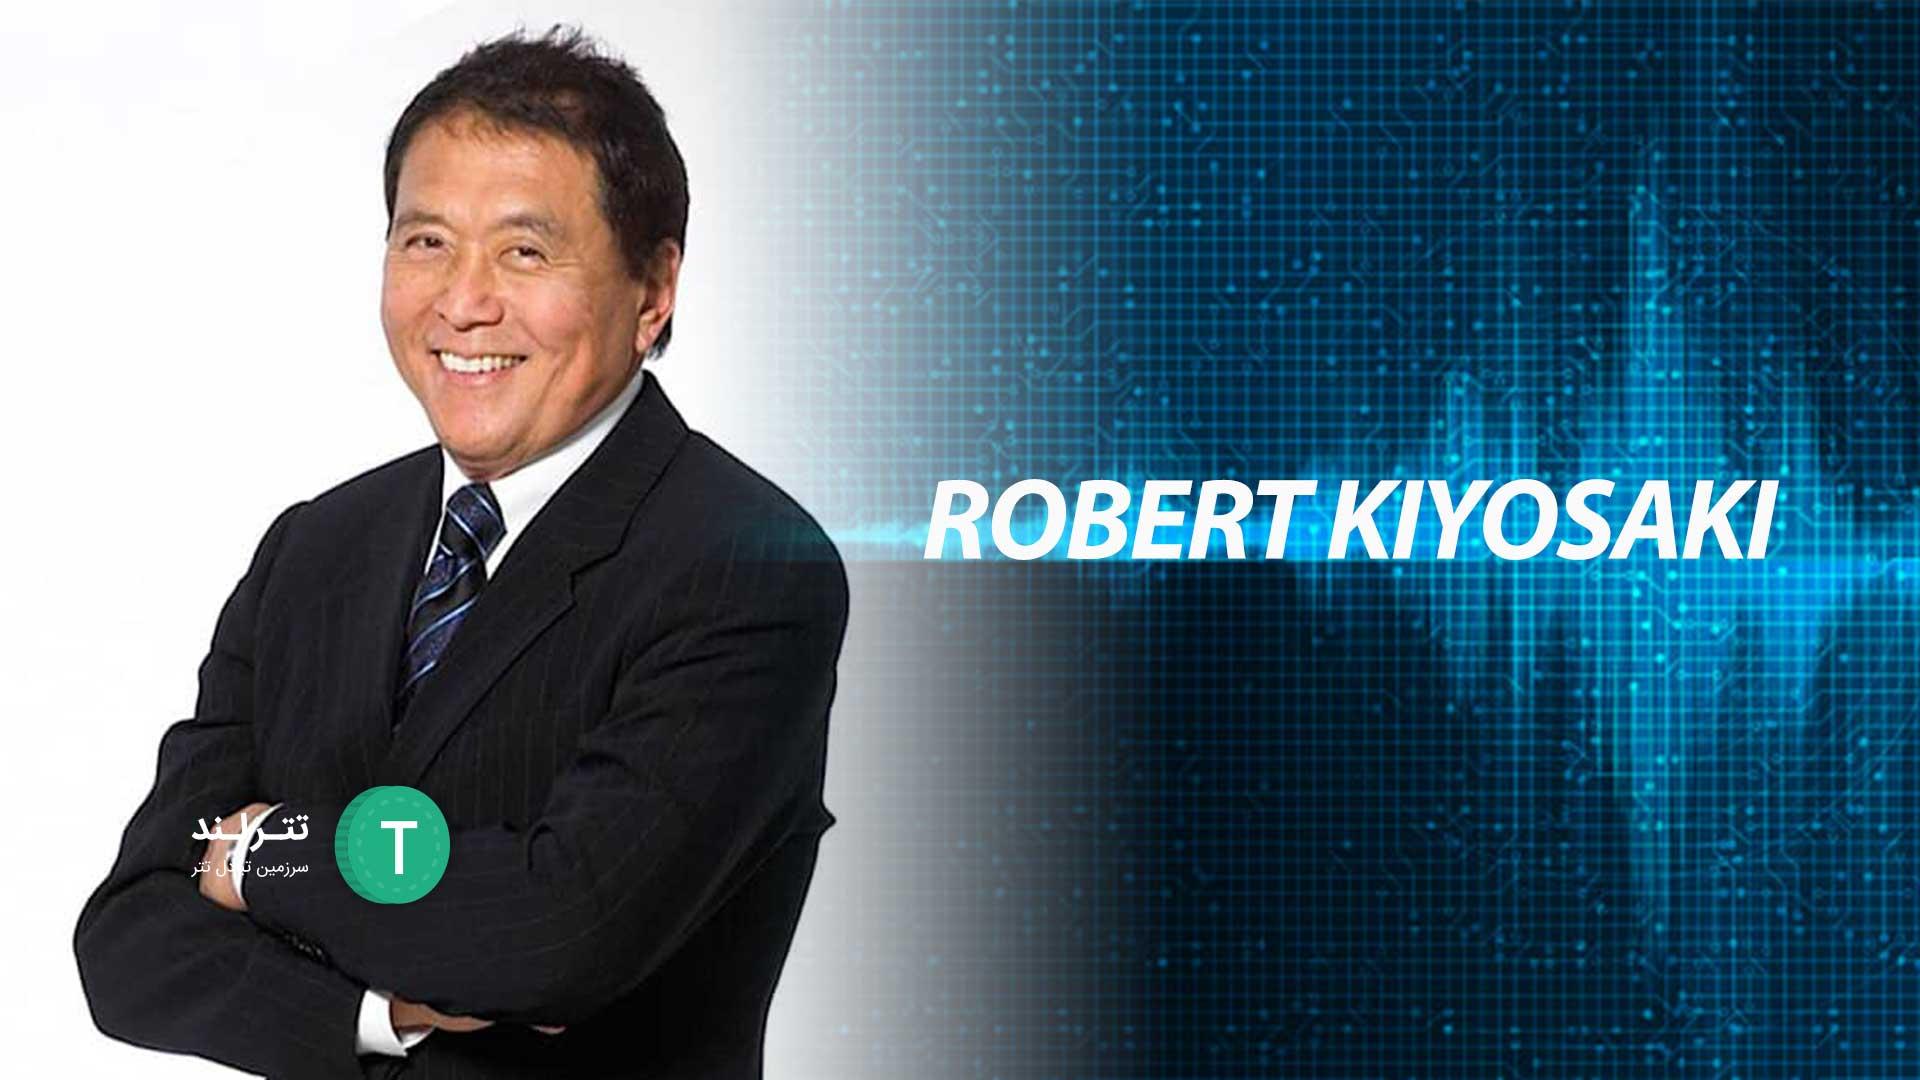 RobertKiyosaki